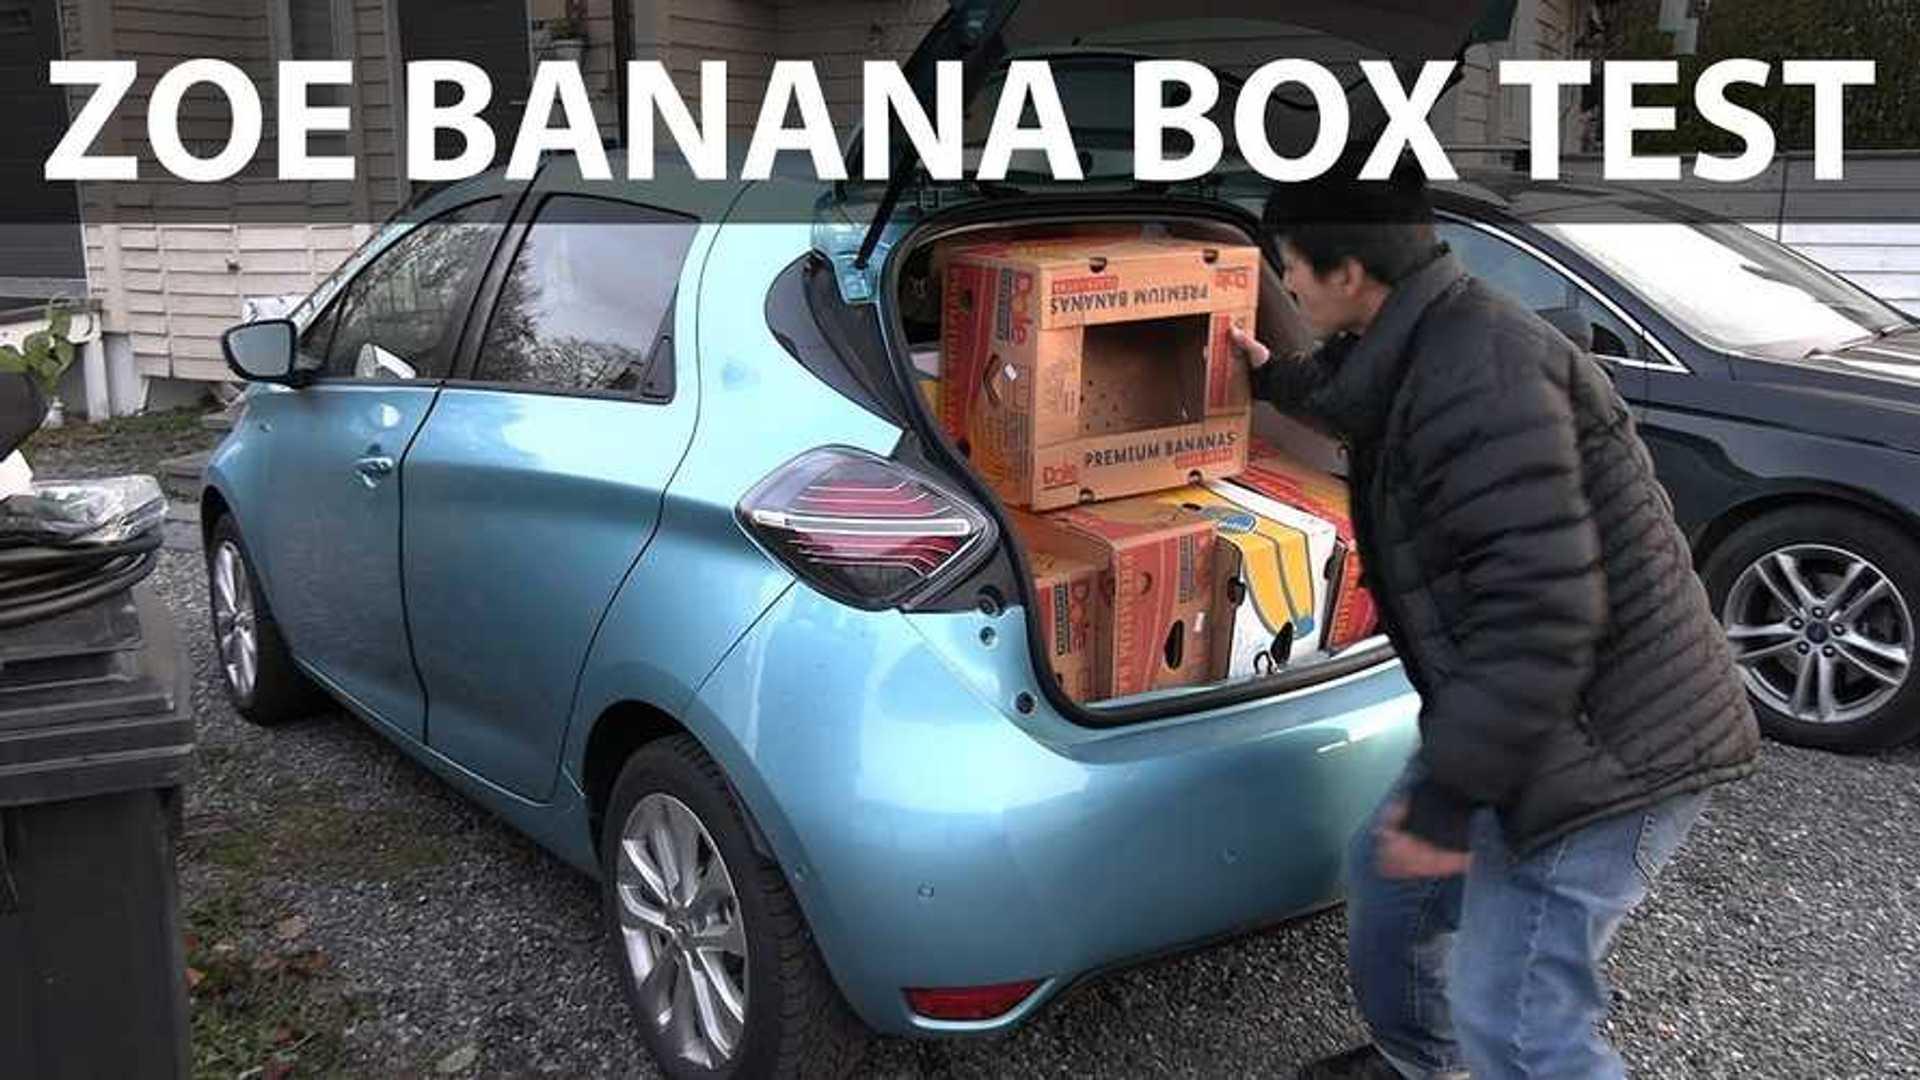 Renault Zoe Test >> New Renault Zoe Matches Tesla Model 3 In Banana Box Test